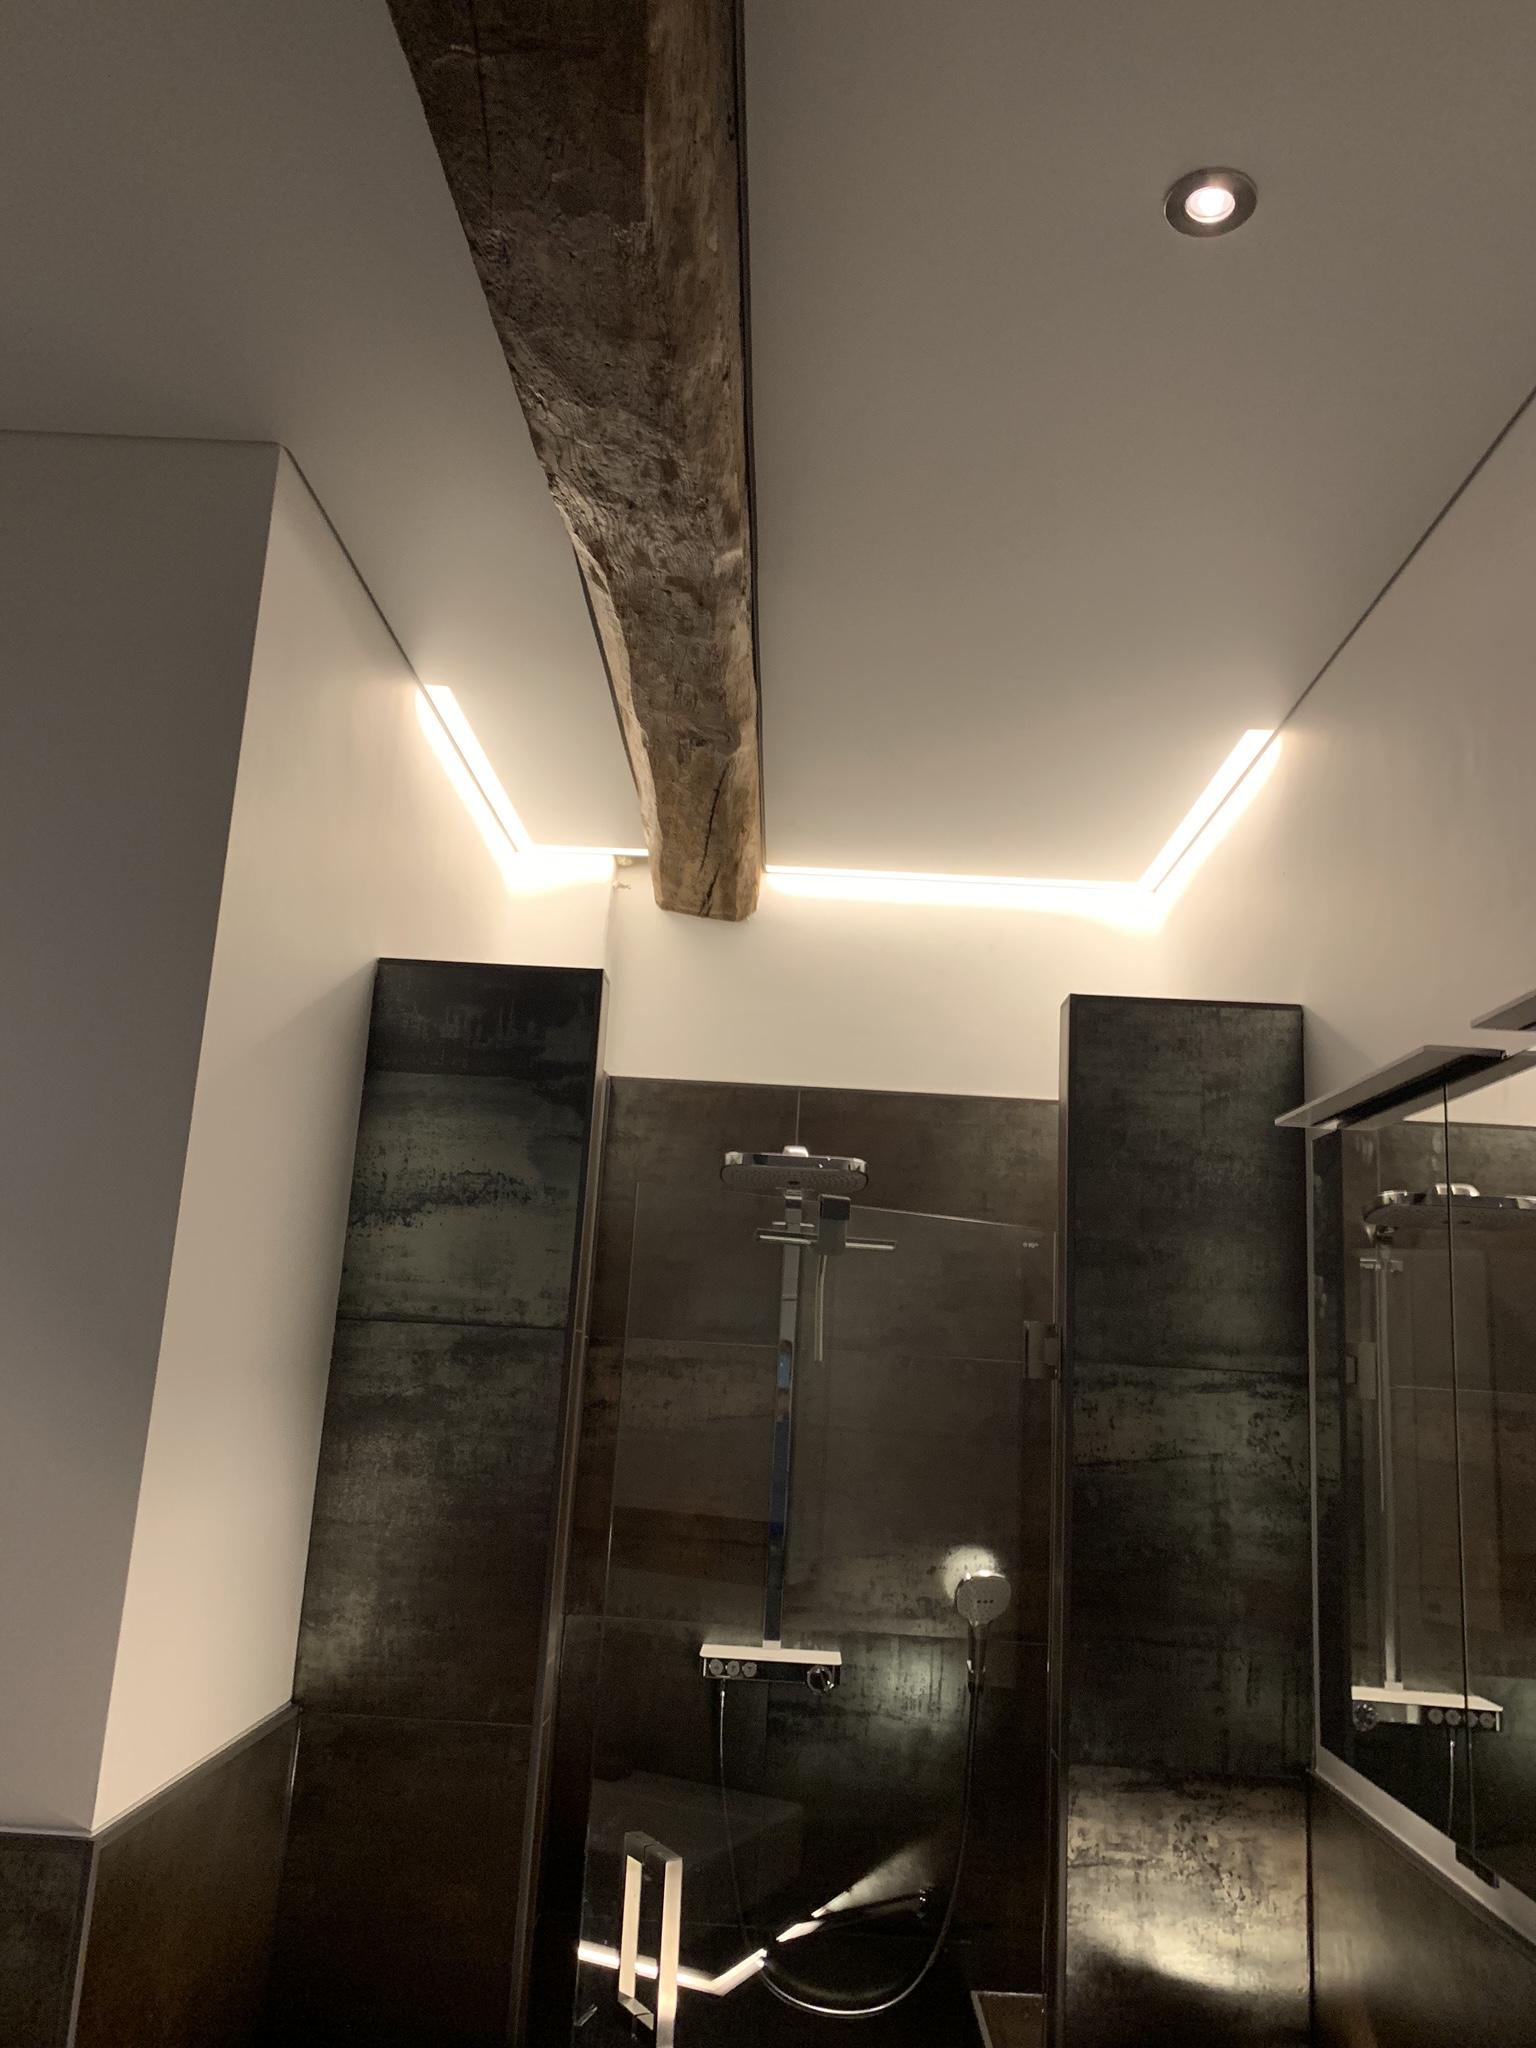 spanplafond met rand en LED spot verlichting in de badkamer